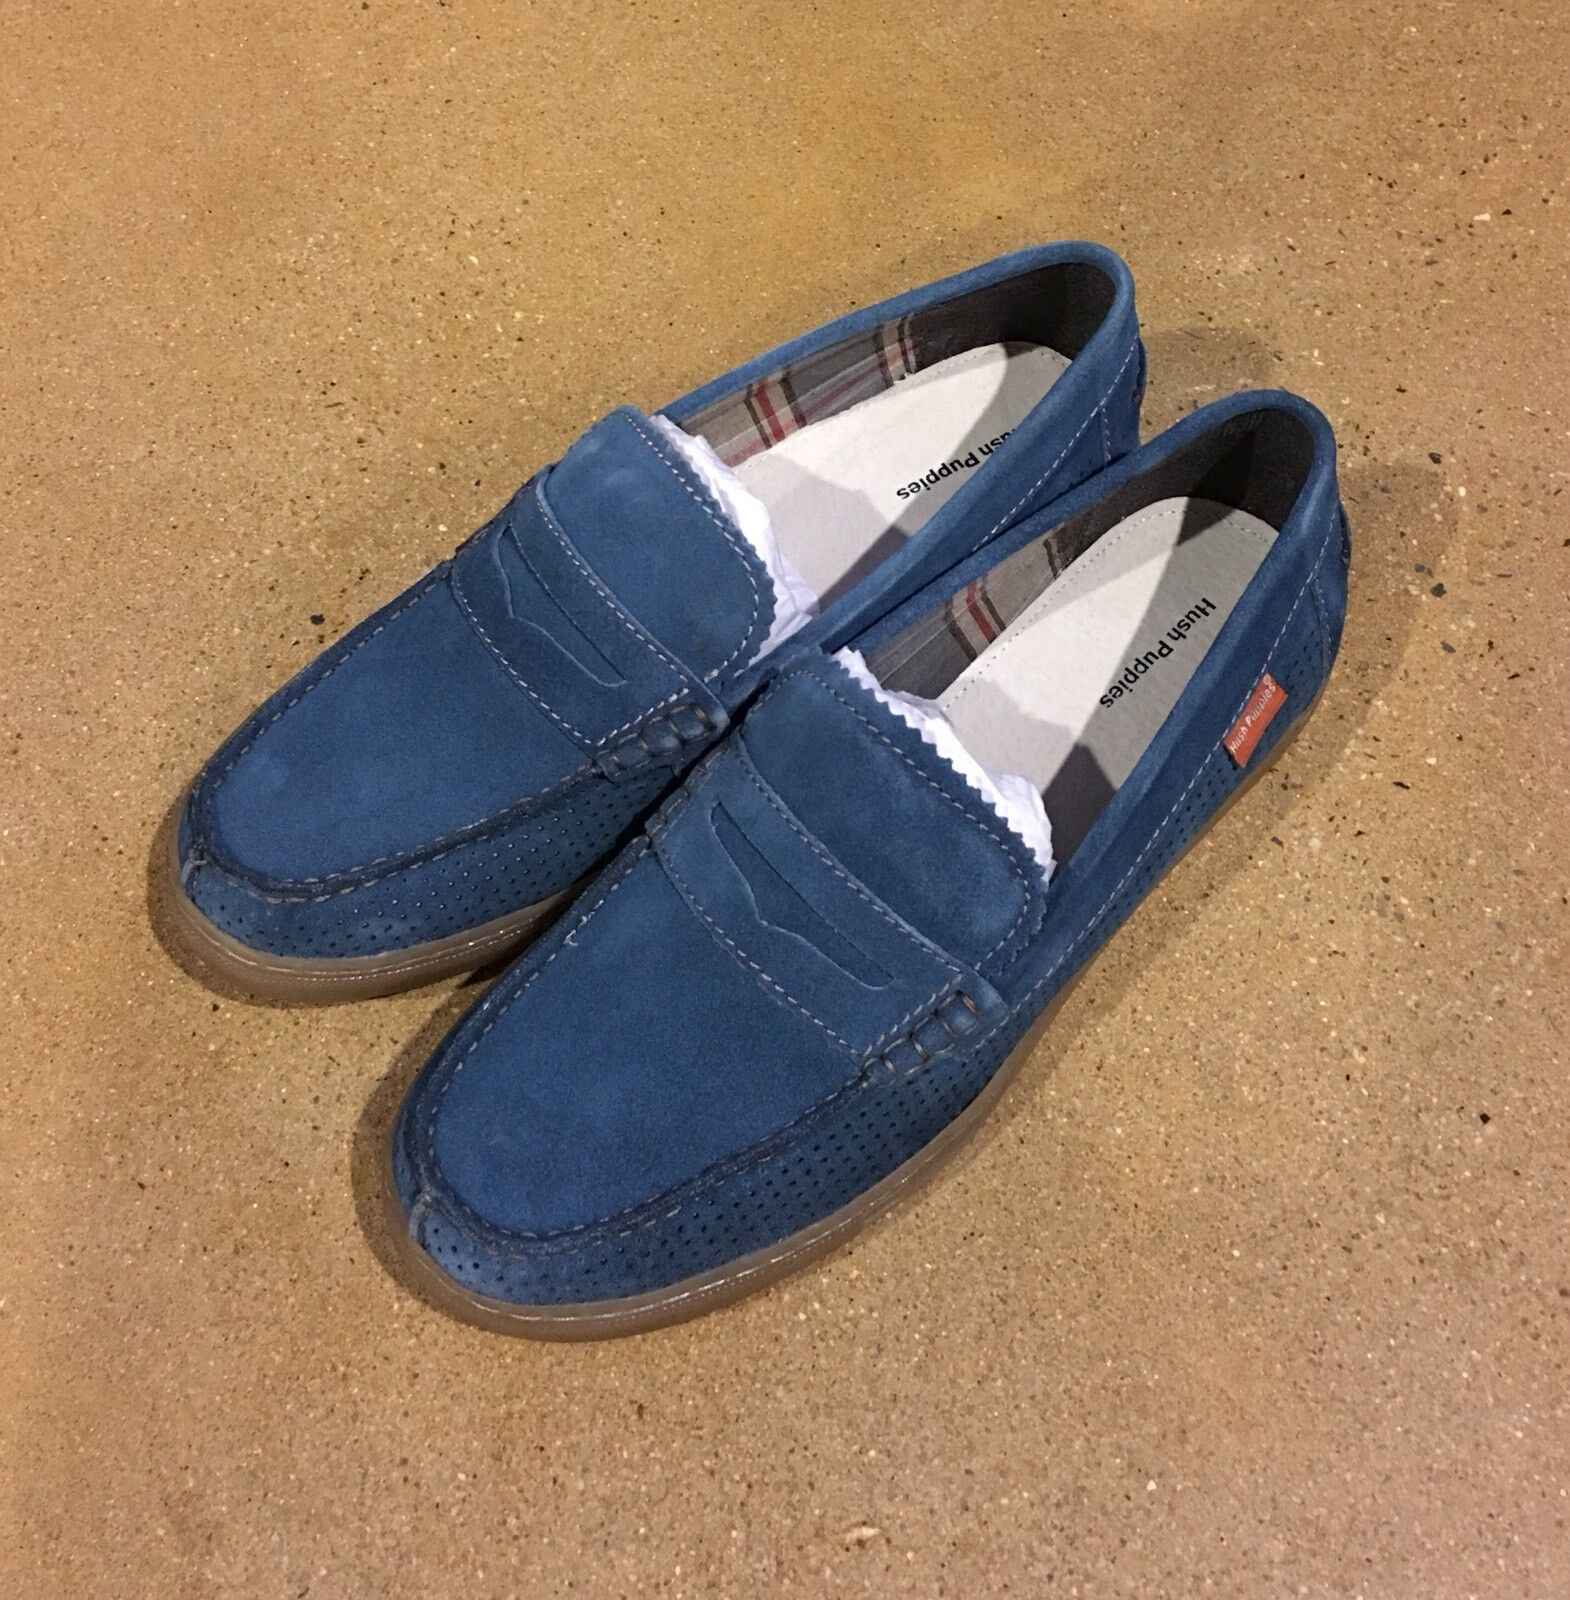 Scarpe casual da uomo Hush Puppies Tyson Thorpe IIV Size 12 Denim Oxford Loafers Slip On Casual Shoes